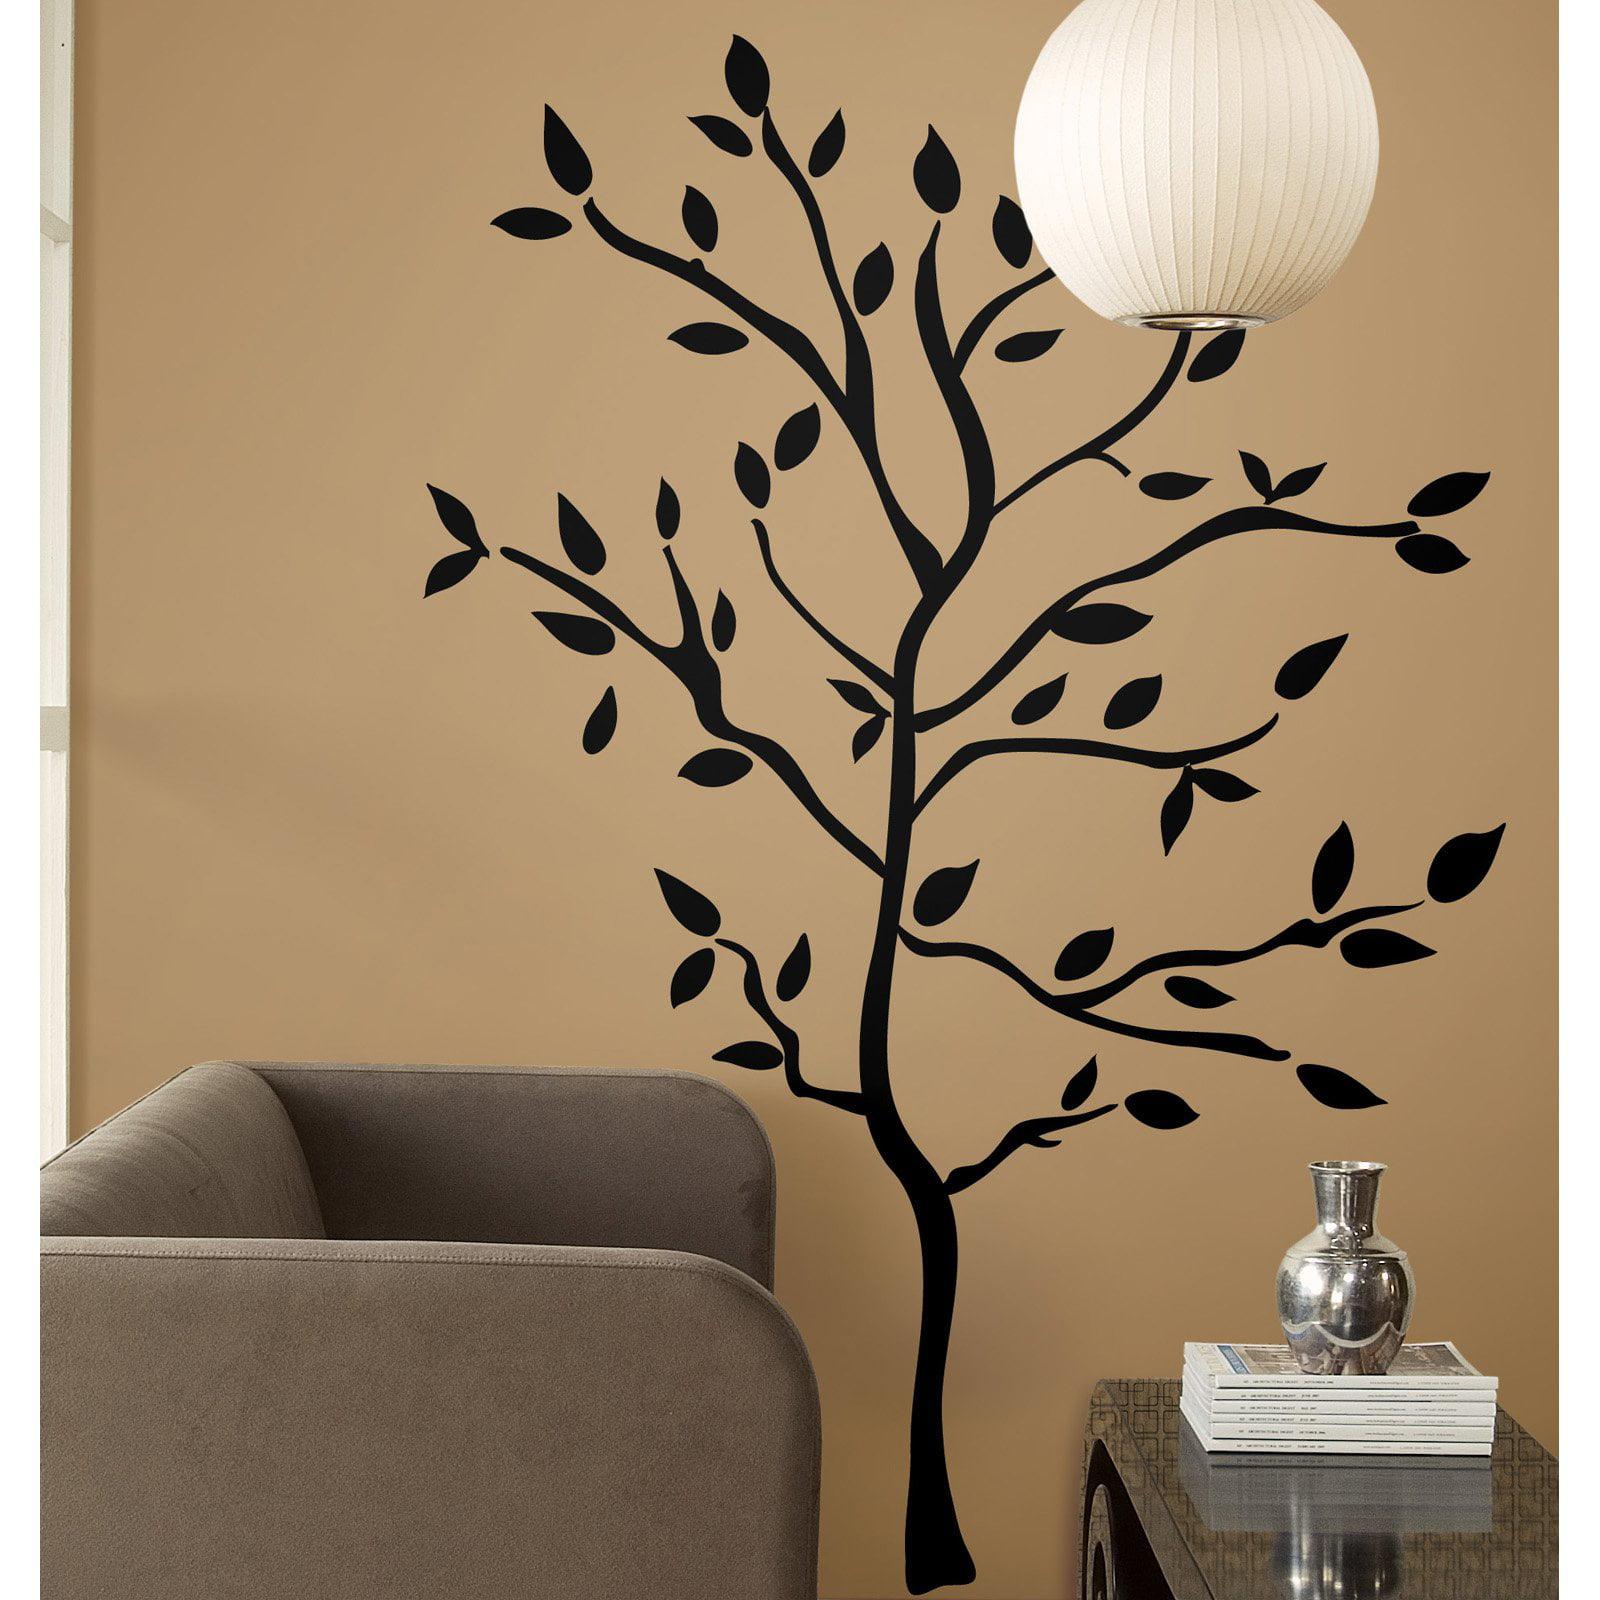 decorative wall decals - walmart